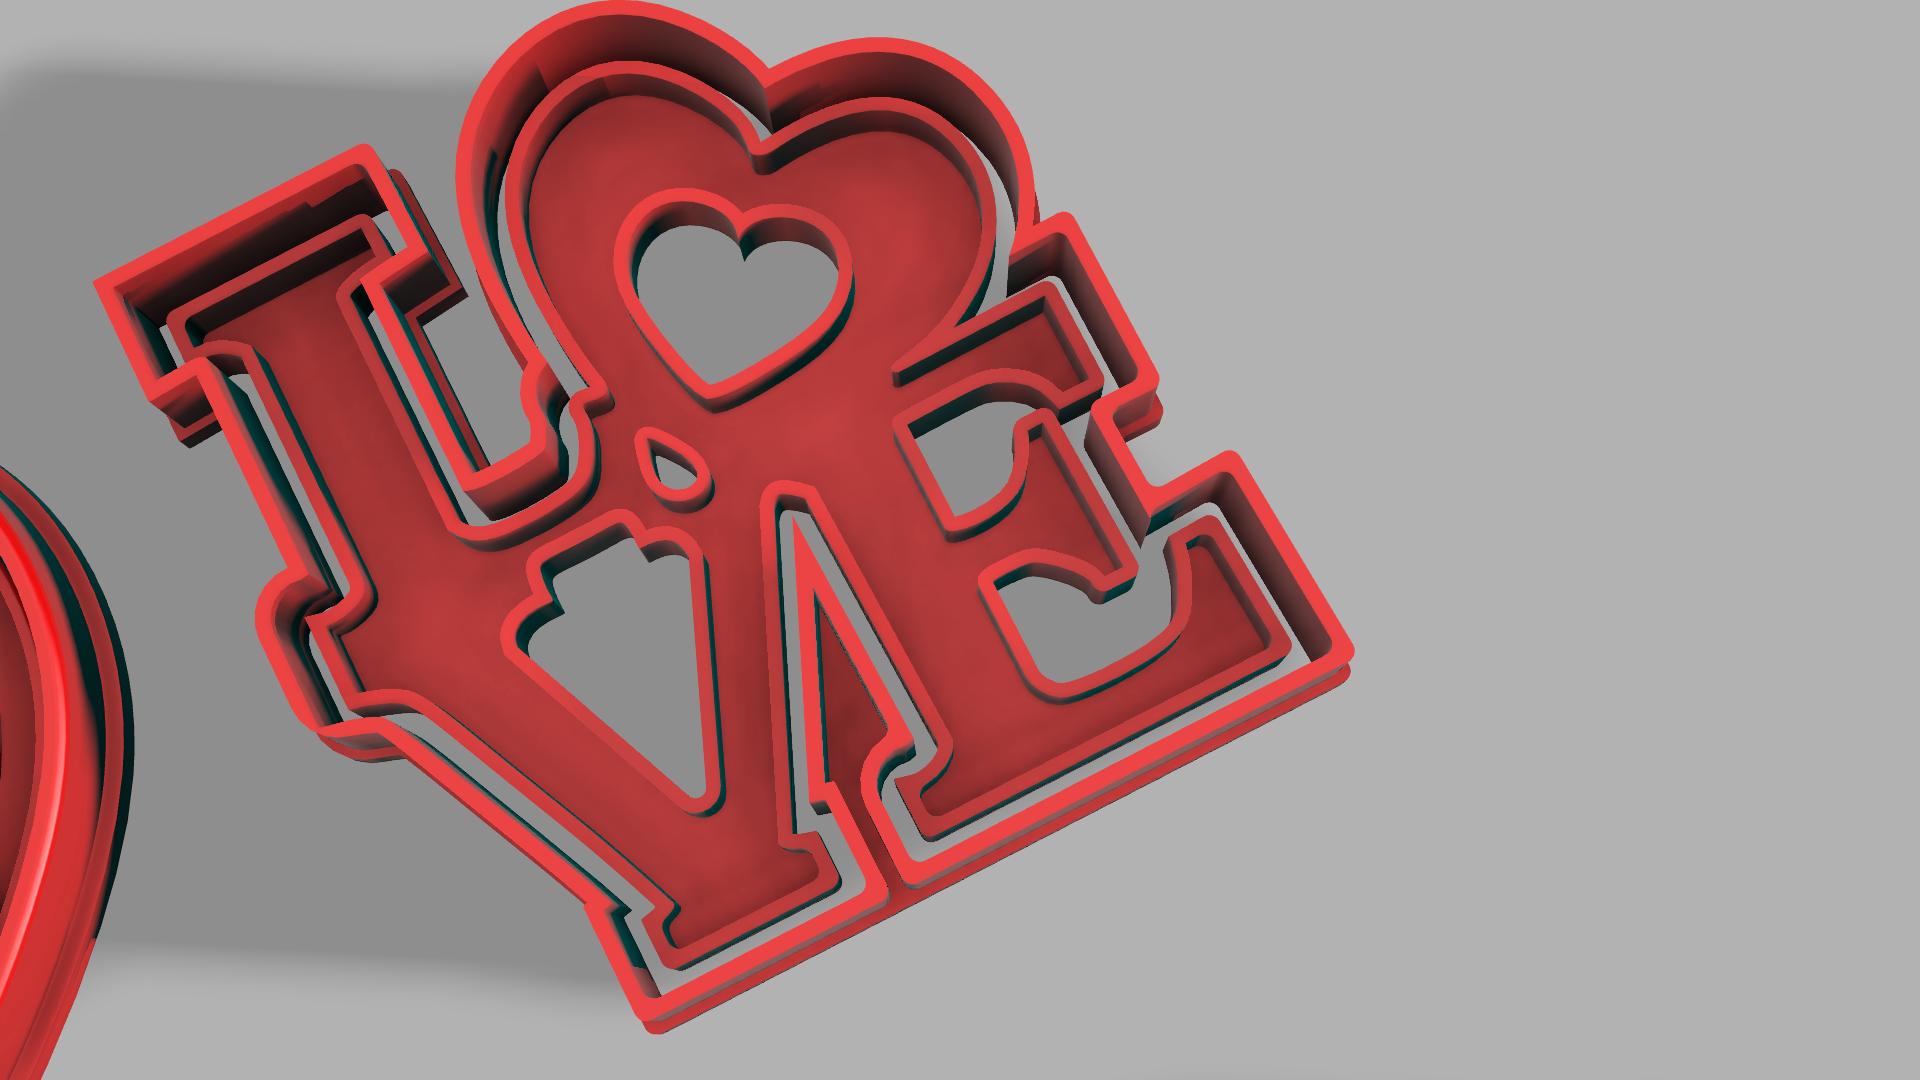 Download Free Stl File Love Cutter Design To 3d Print Cults